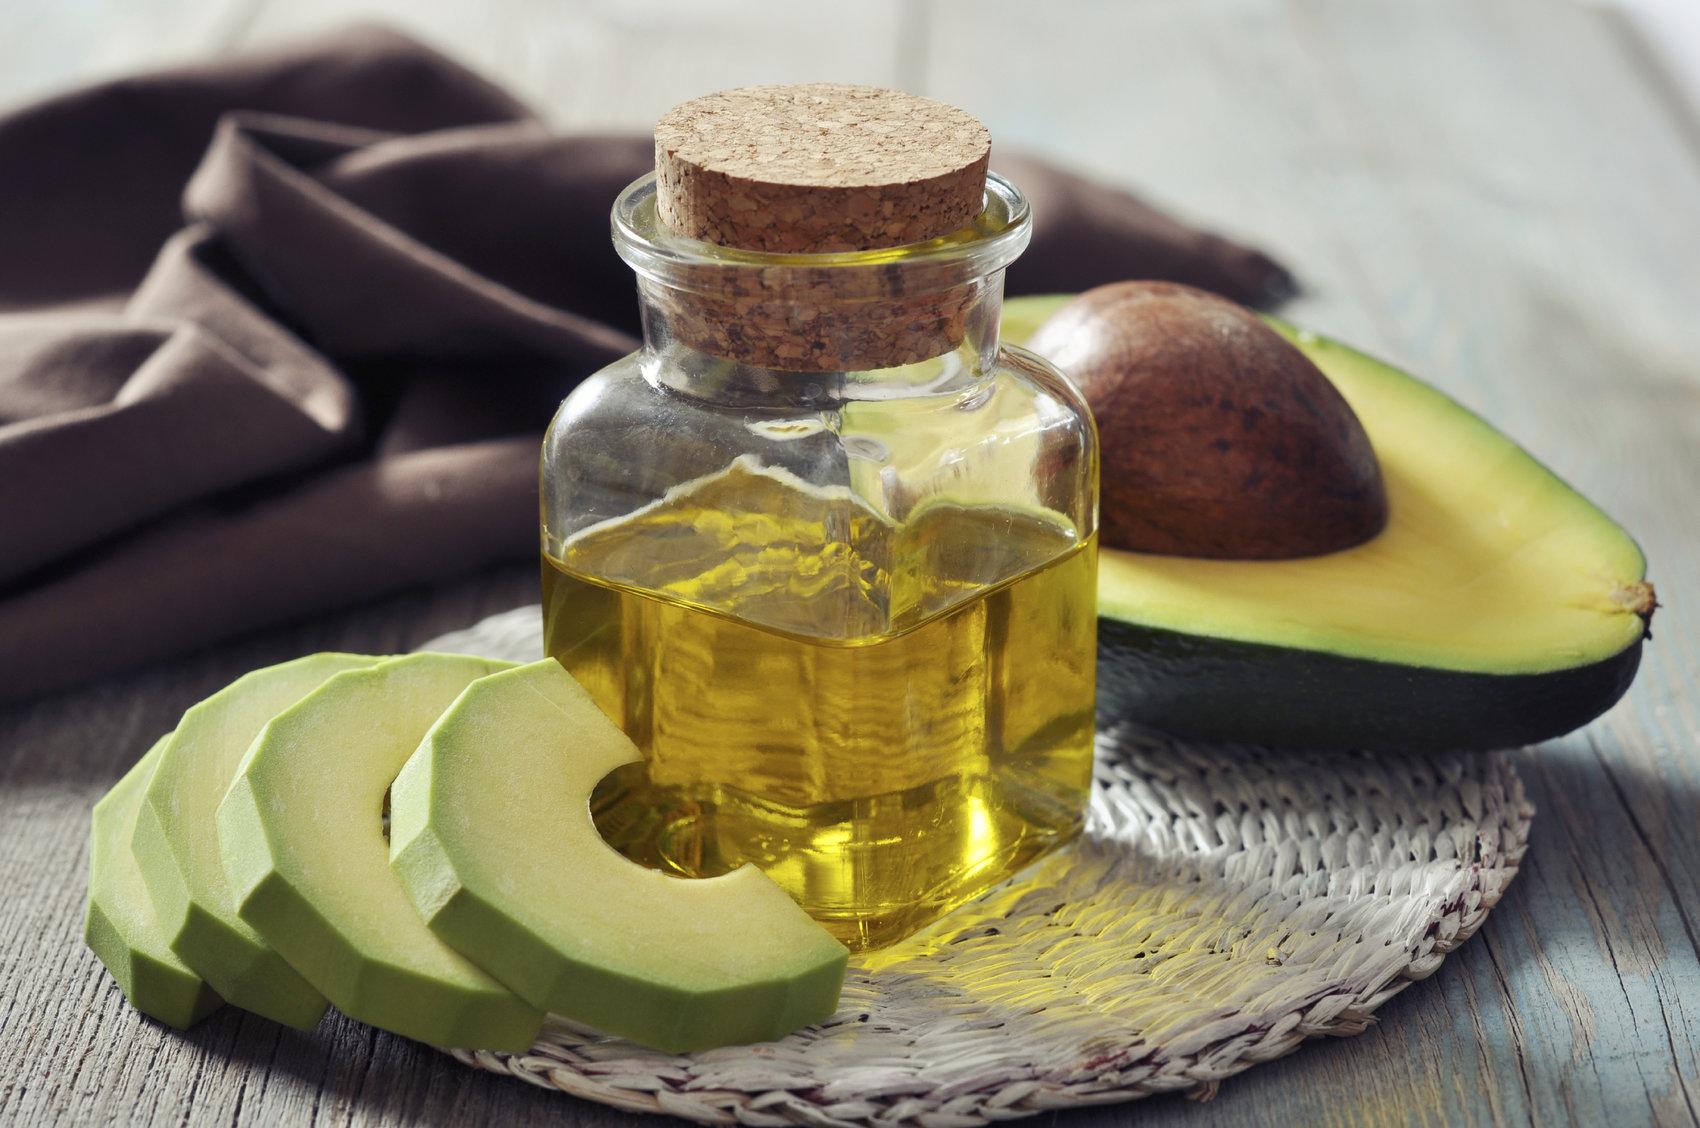 Avocado Oil For Soap Making